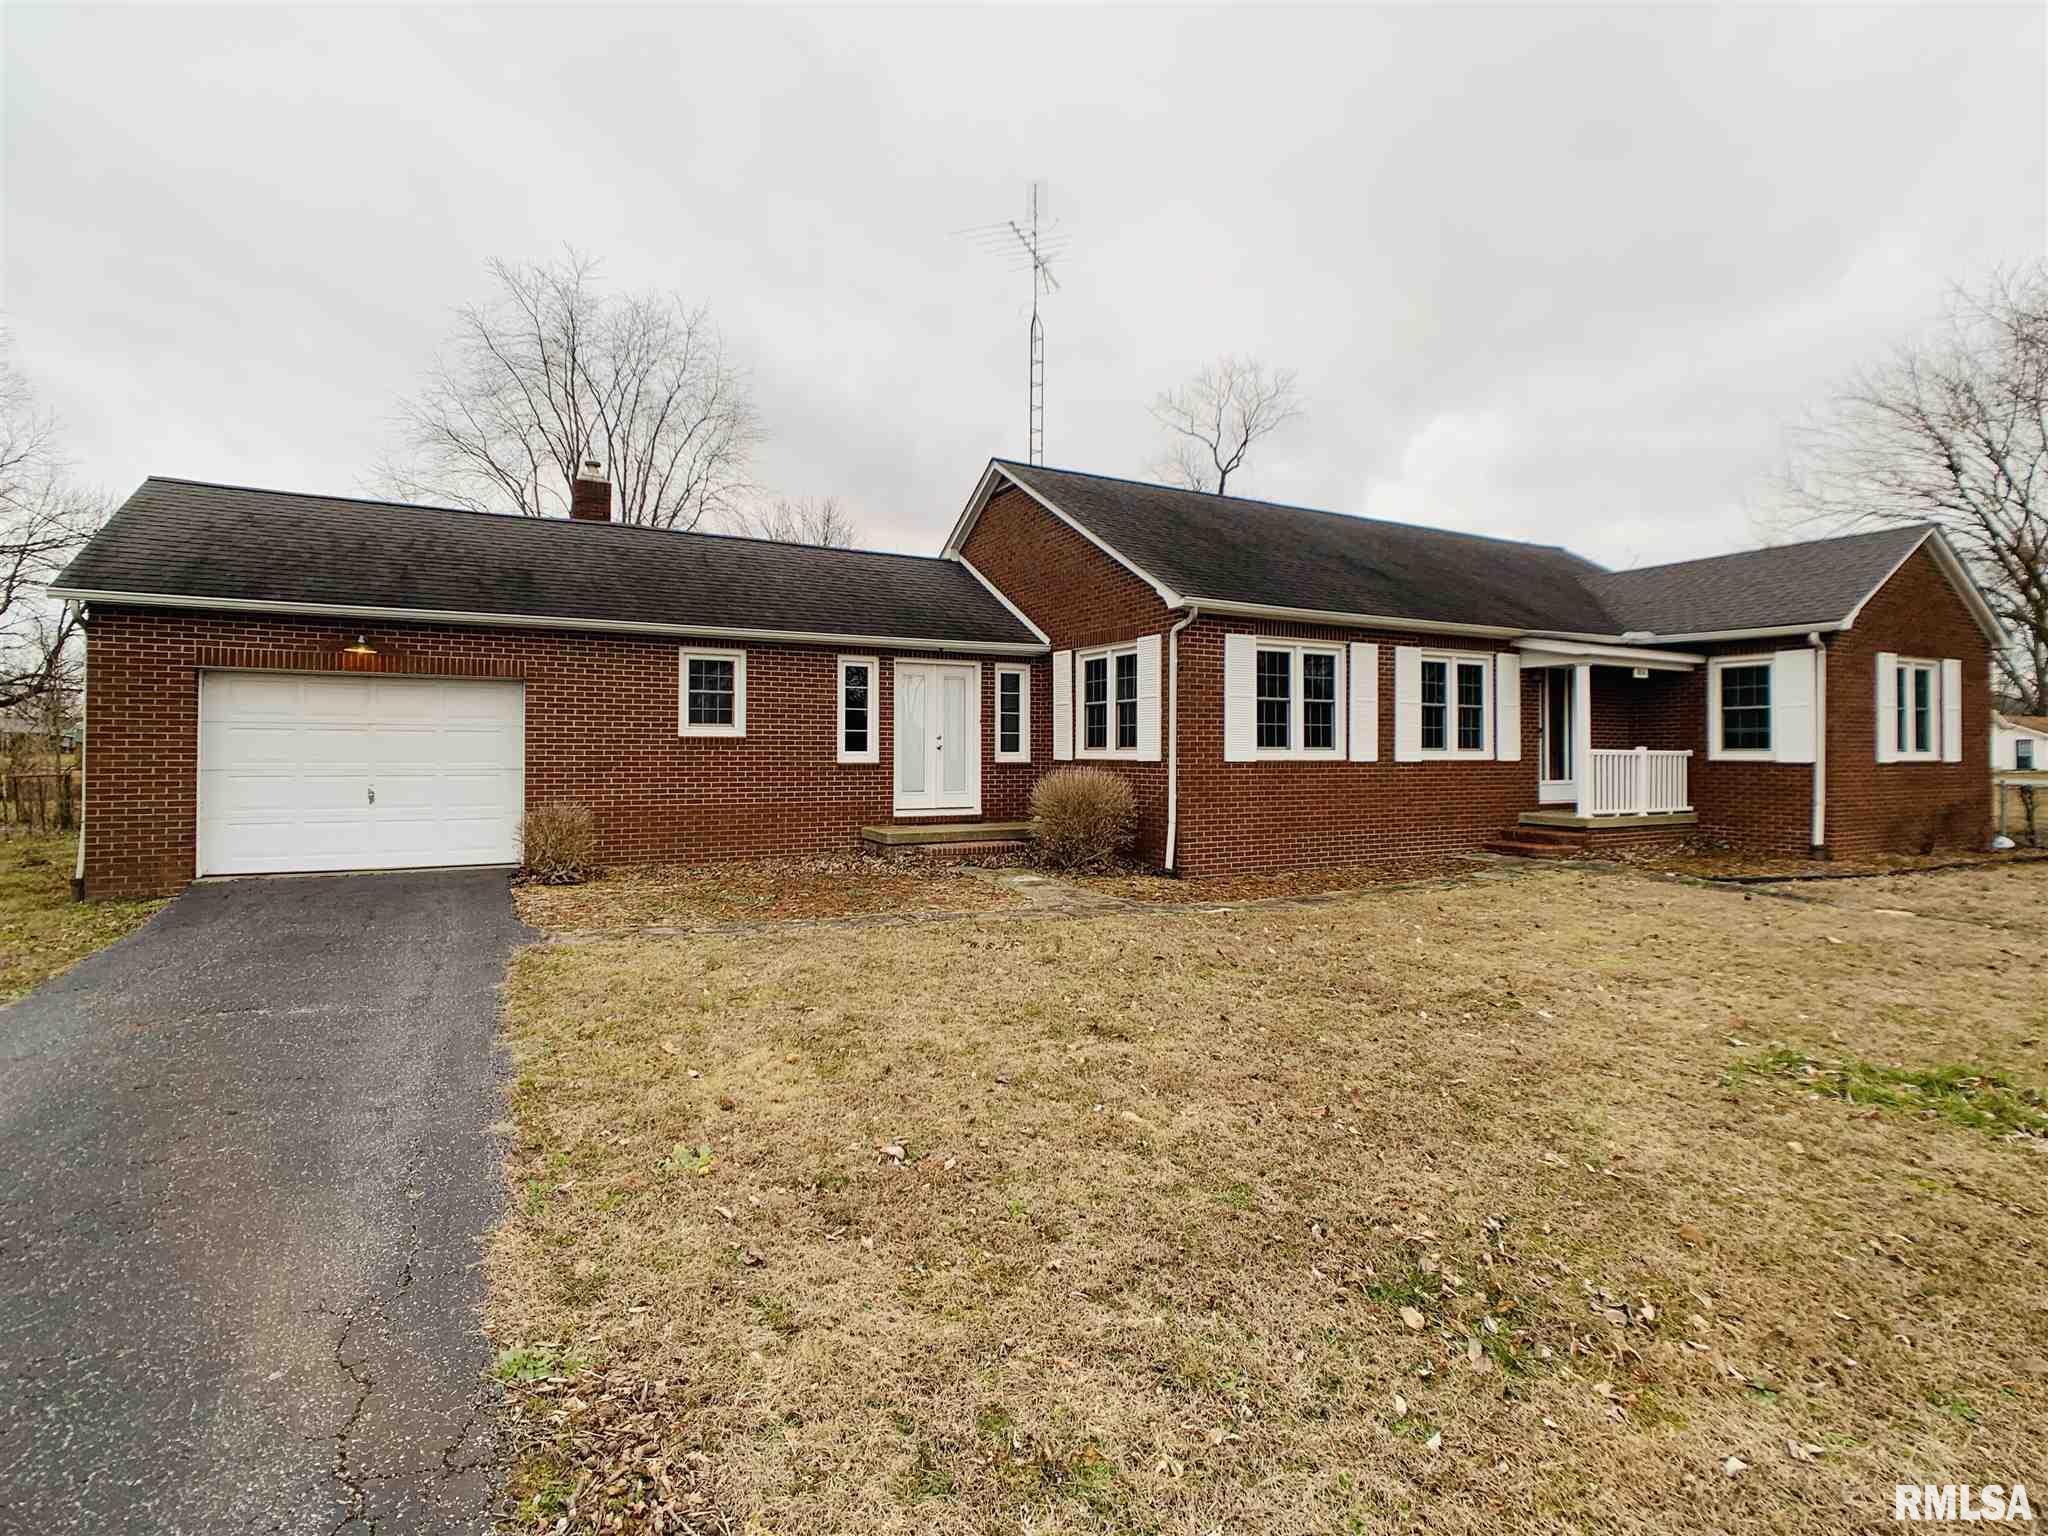 814 E MAIN Property Photo - Ridgway, IL real estate listing